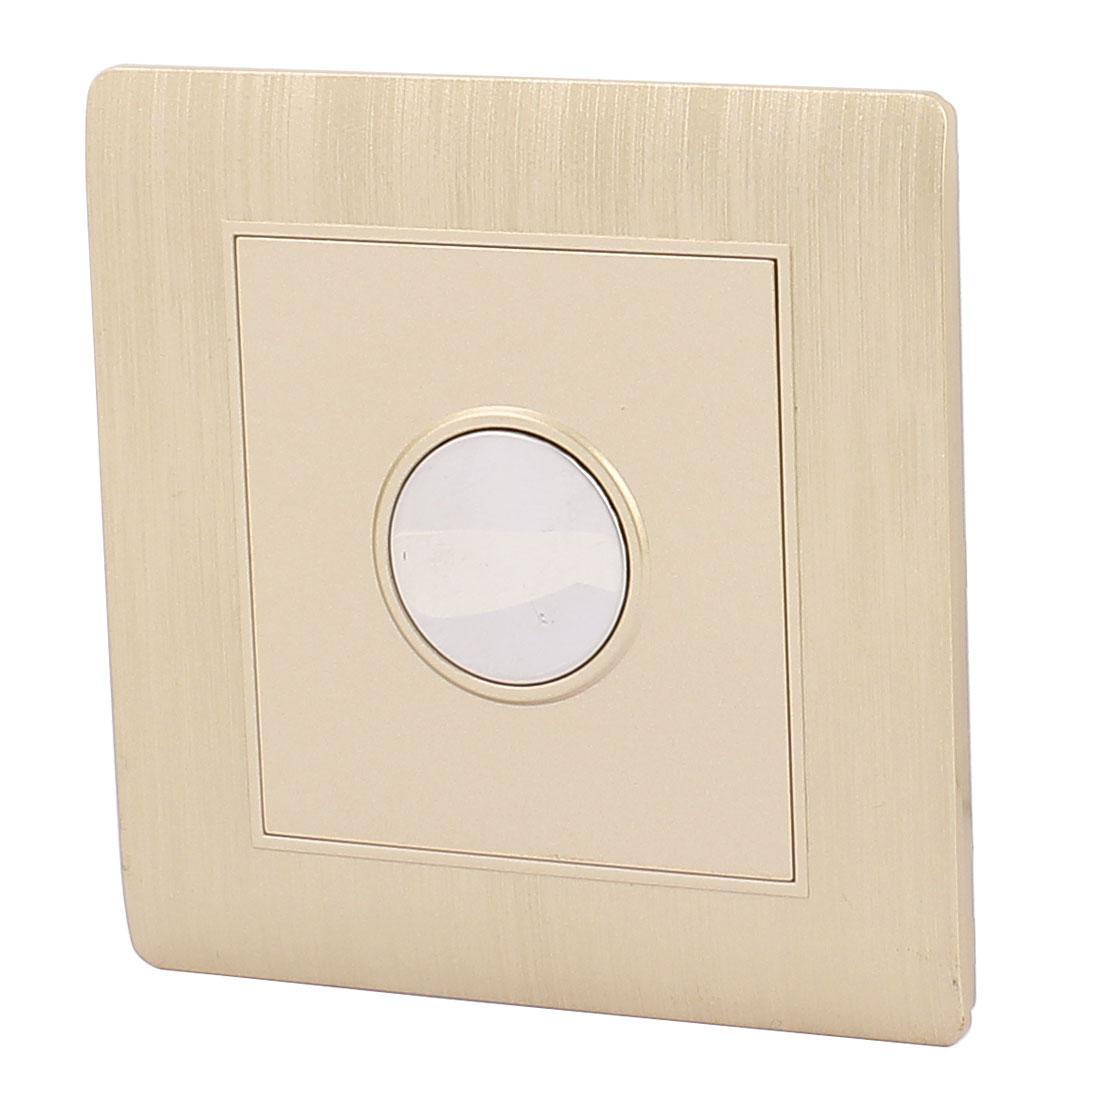 AC 180V-250V Touching Sensor Switch Flame Retardant PC Time Delay Switch Gold